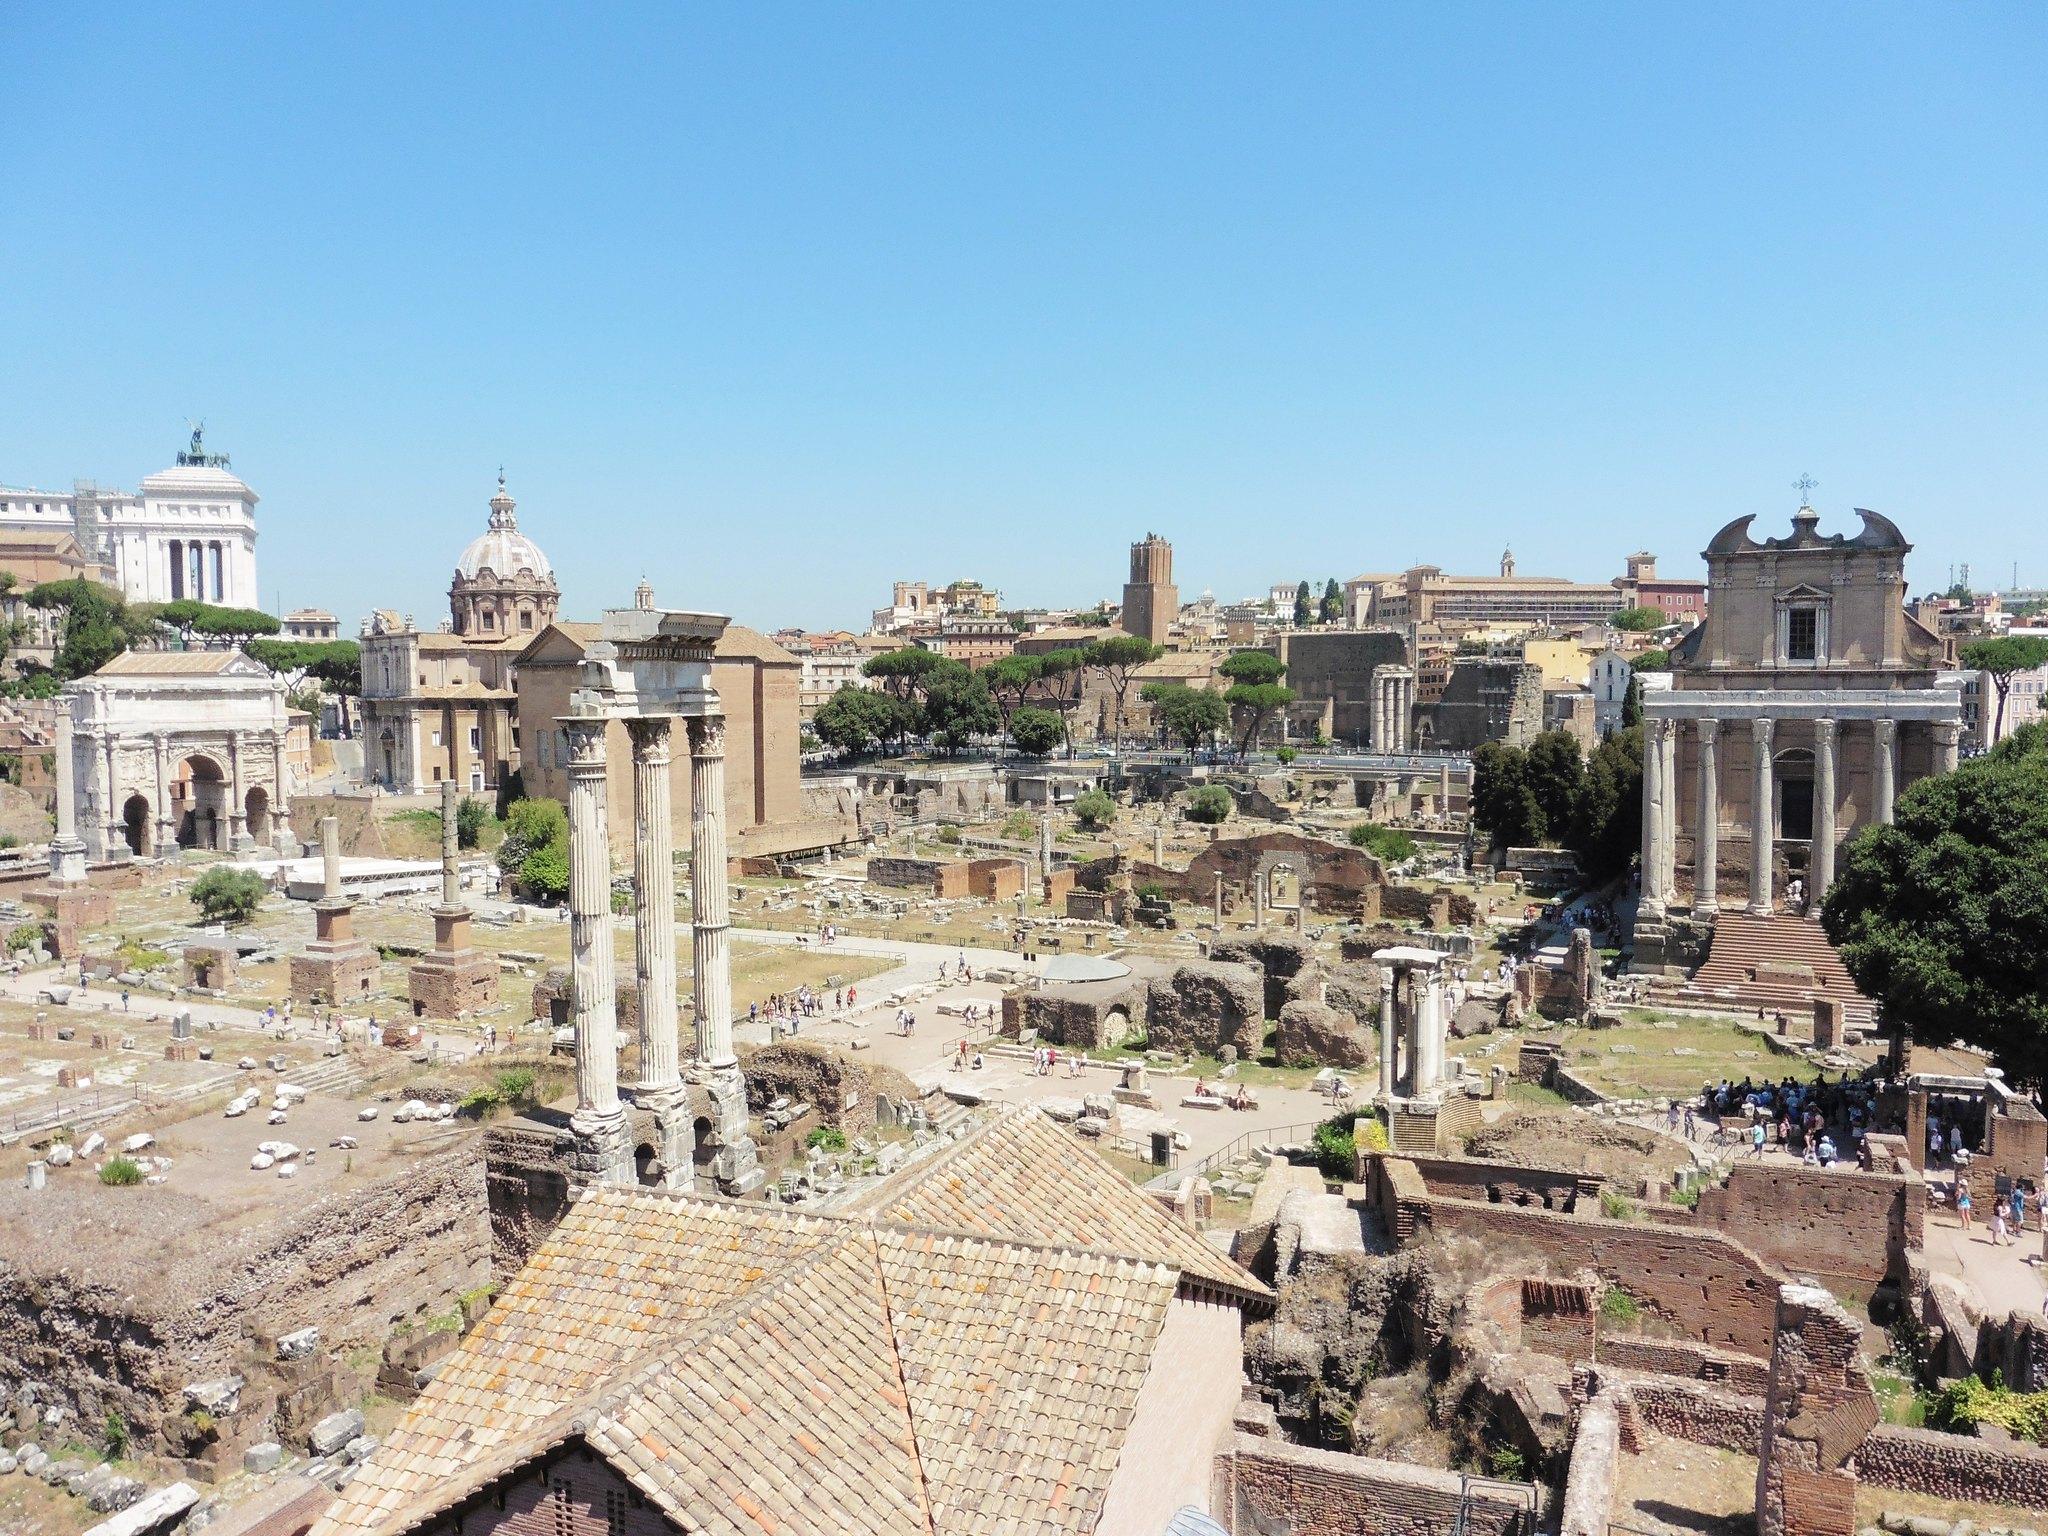 View of Roman Forum